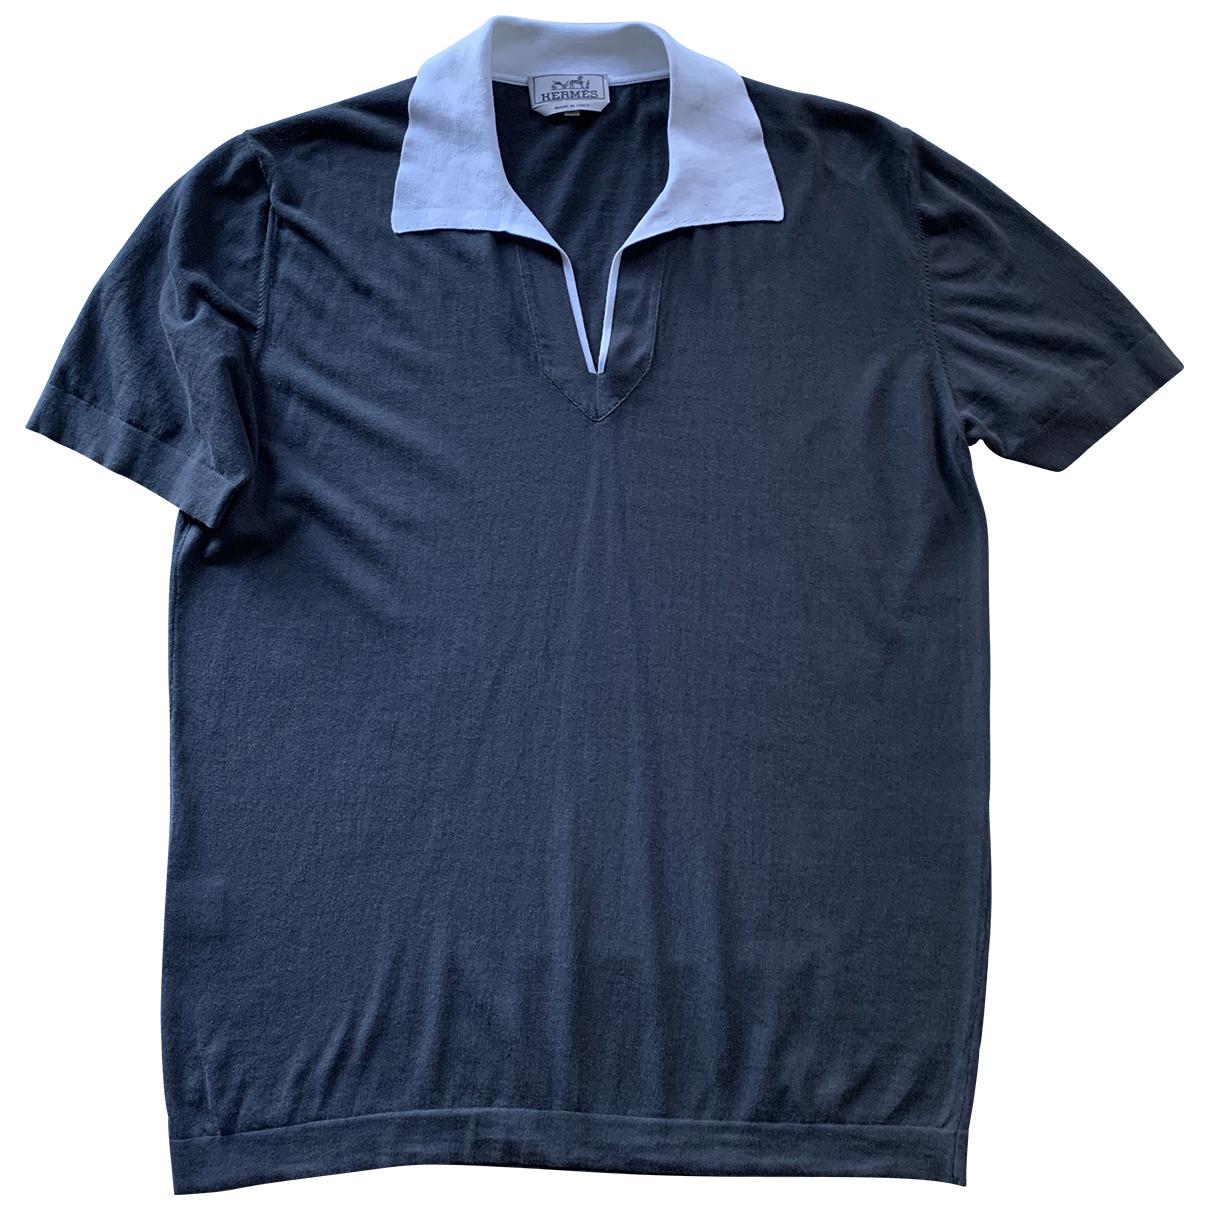 Hermes - Polos   pour homme en coton - bleu